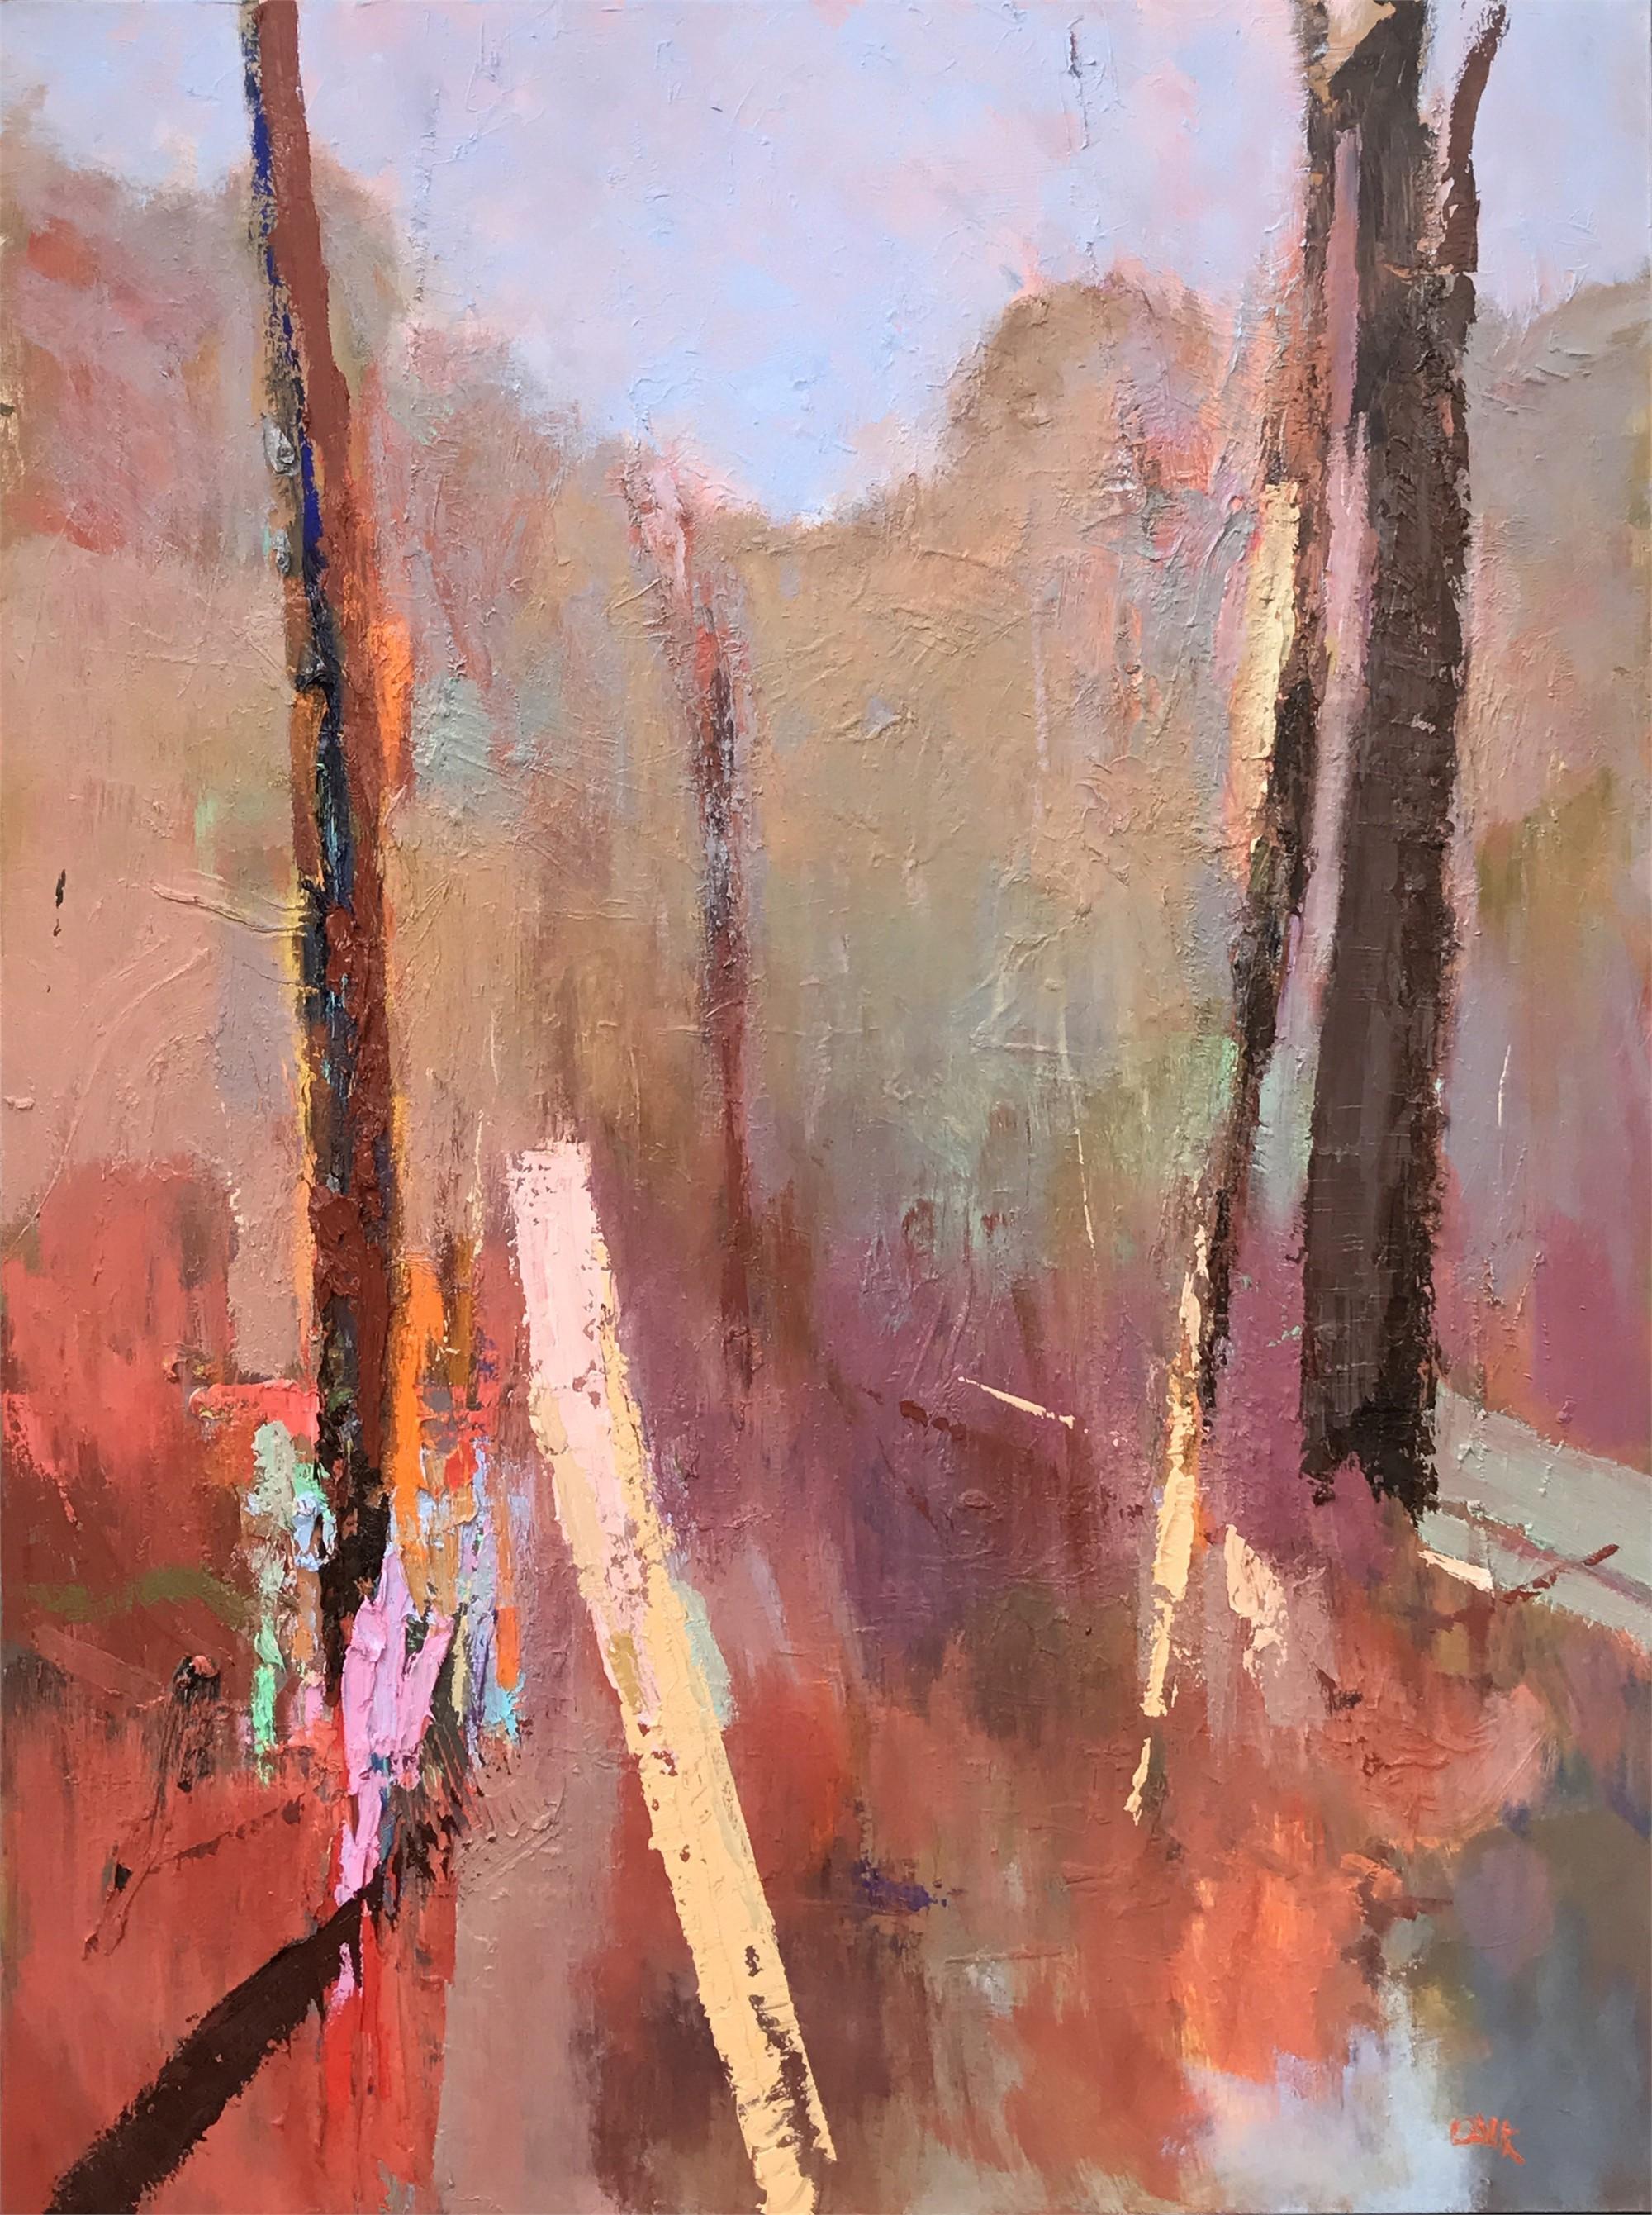 Swamp IV by James Calk